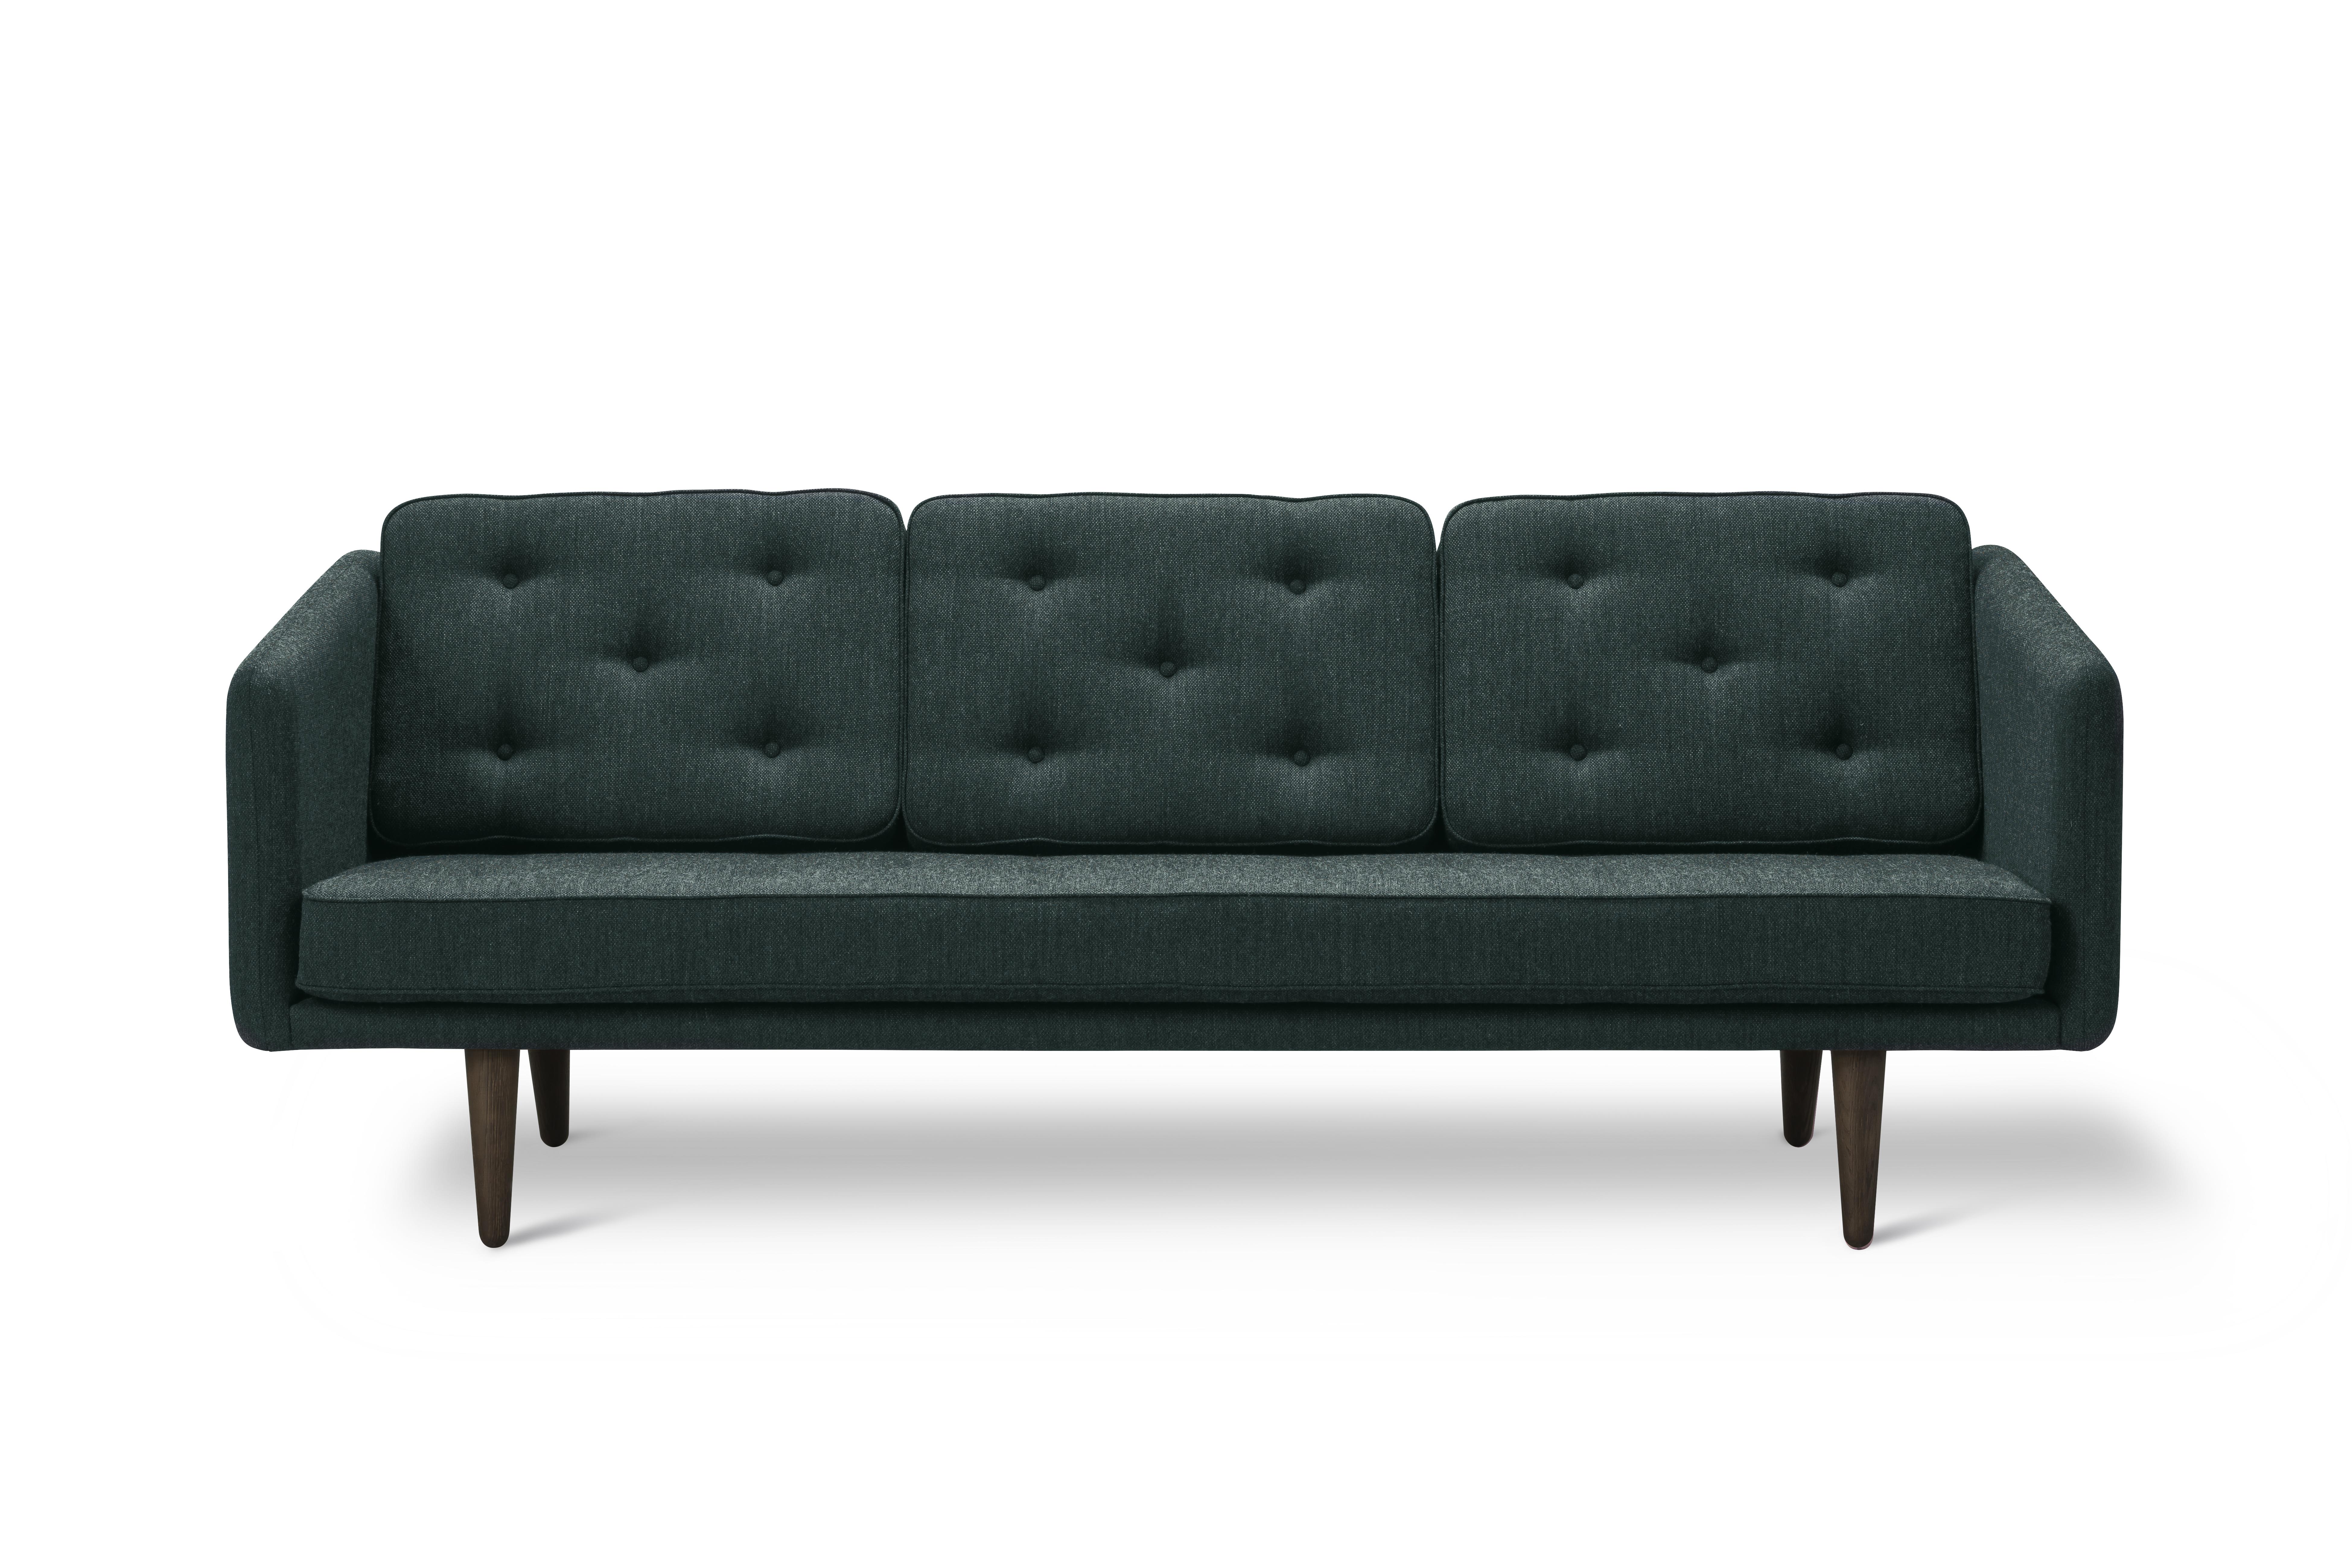 Ungdommelig No. 1 Sofa - 3-seat CY-67